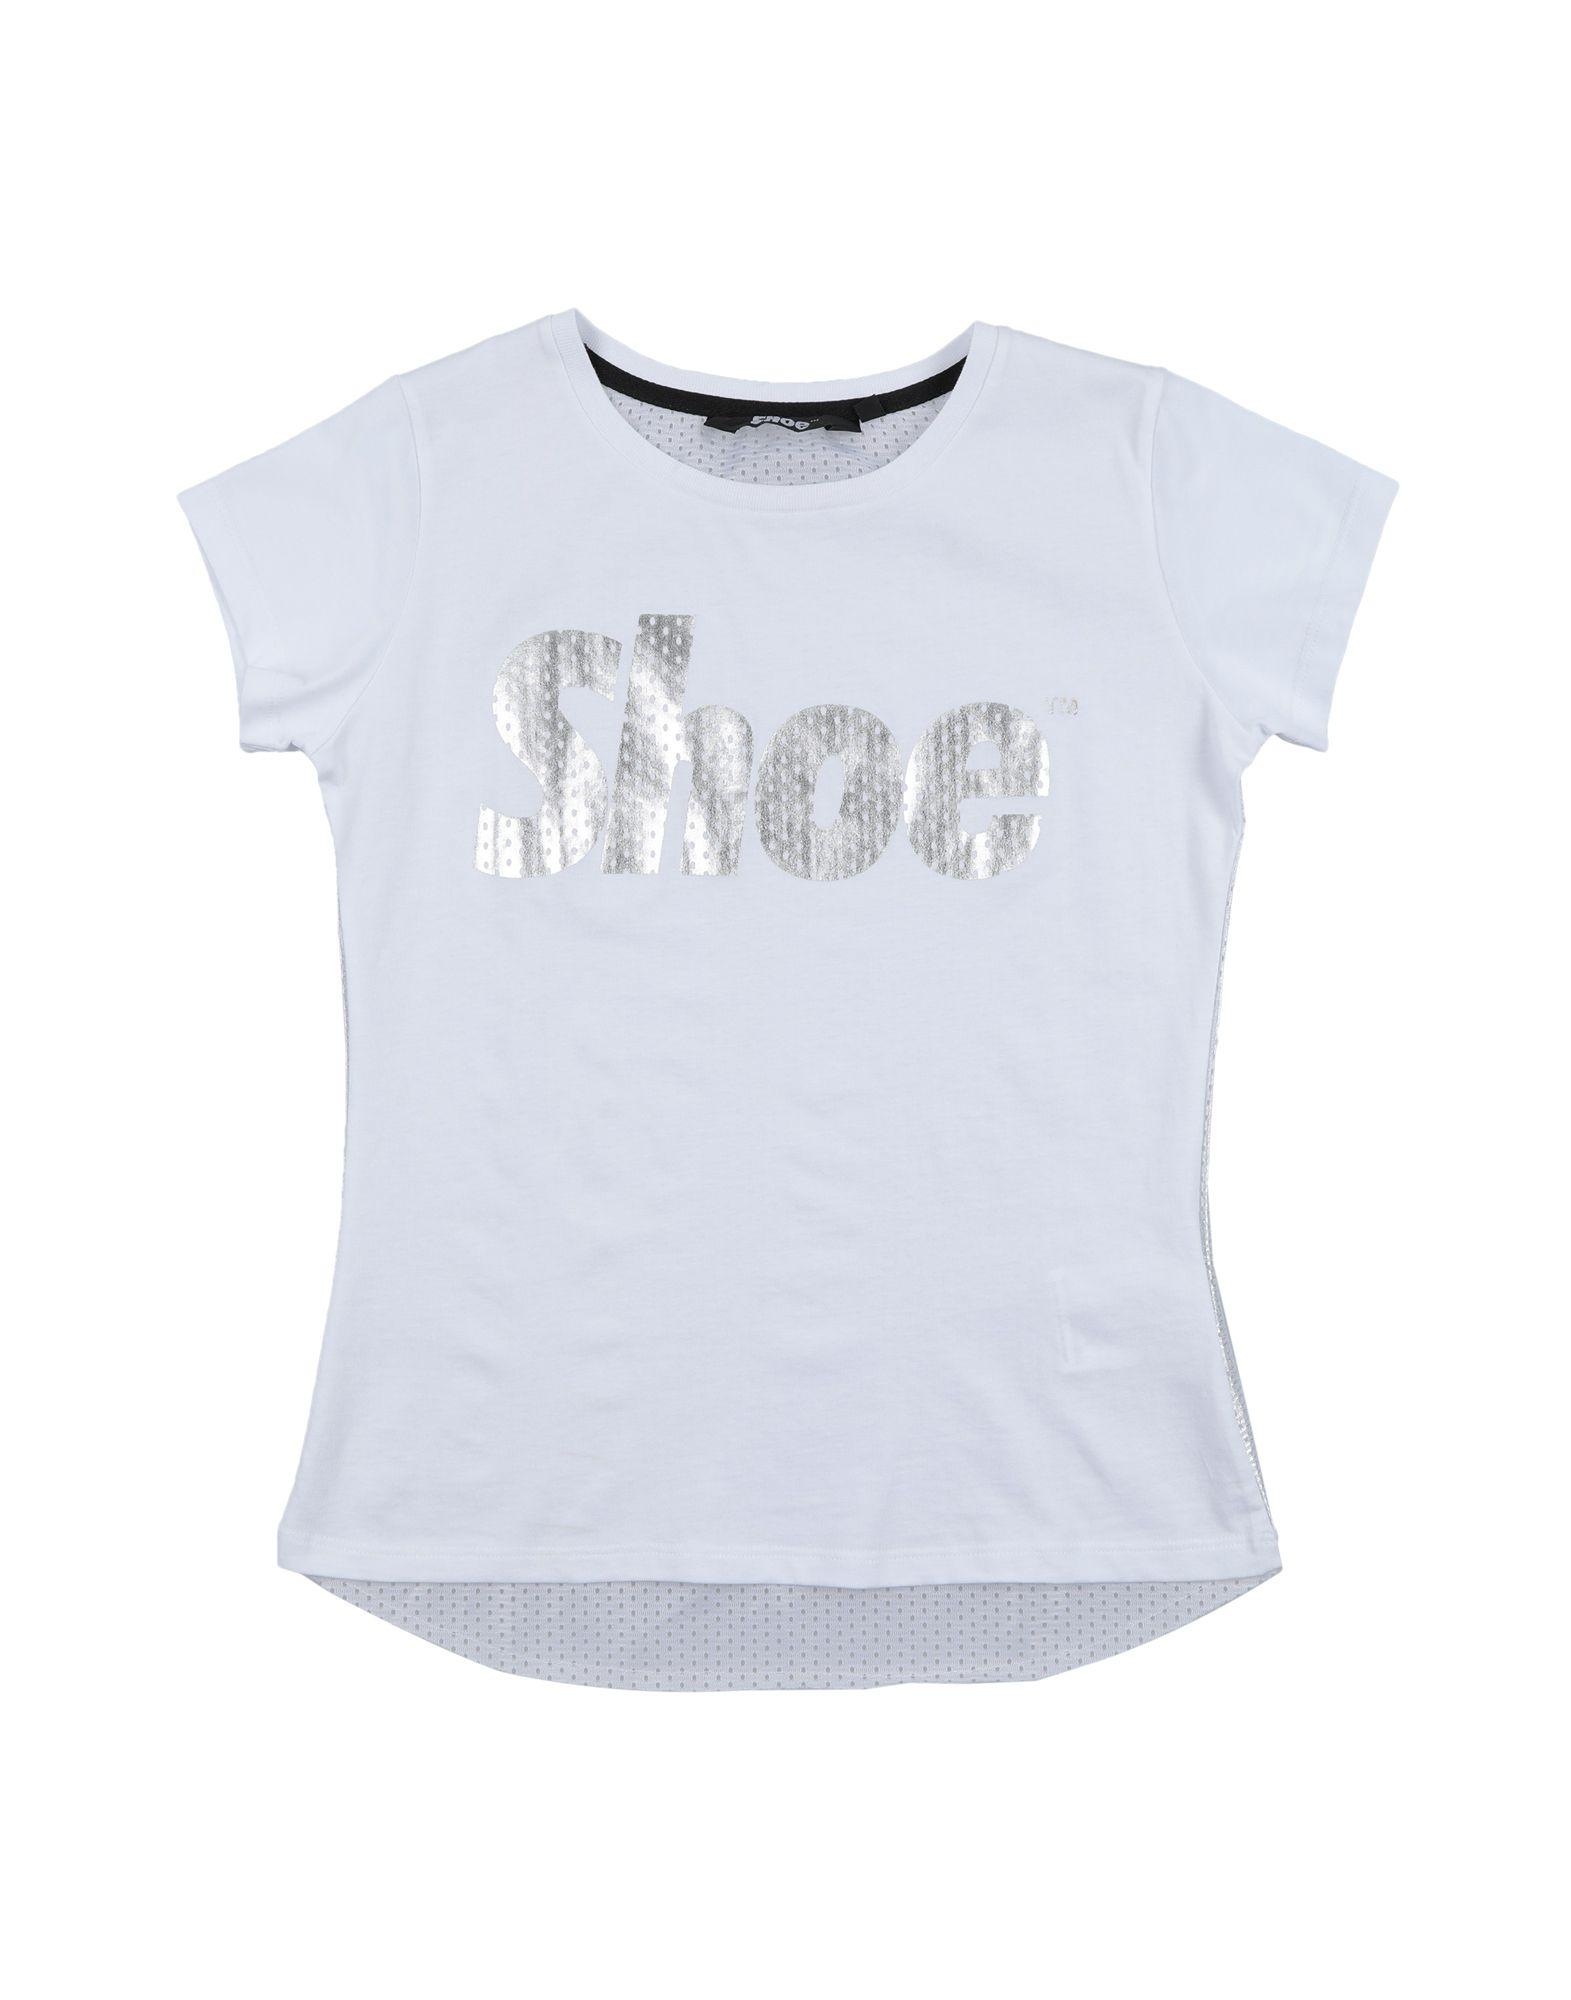 Shoeshine Kids' T-shirts In White